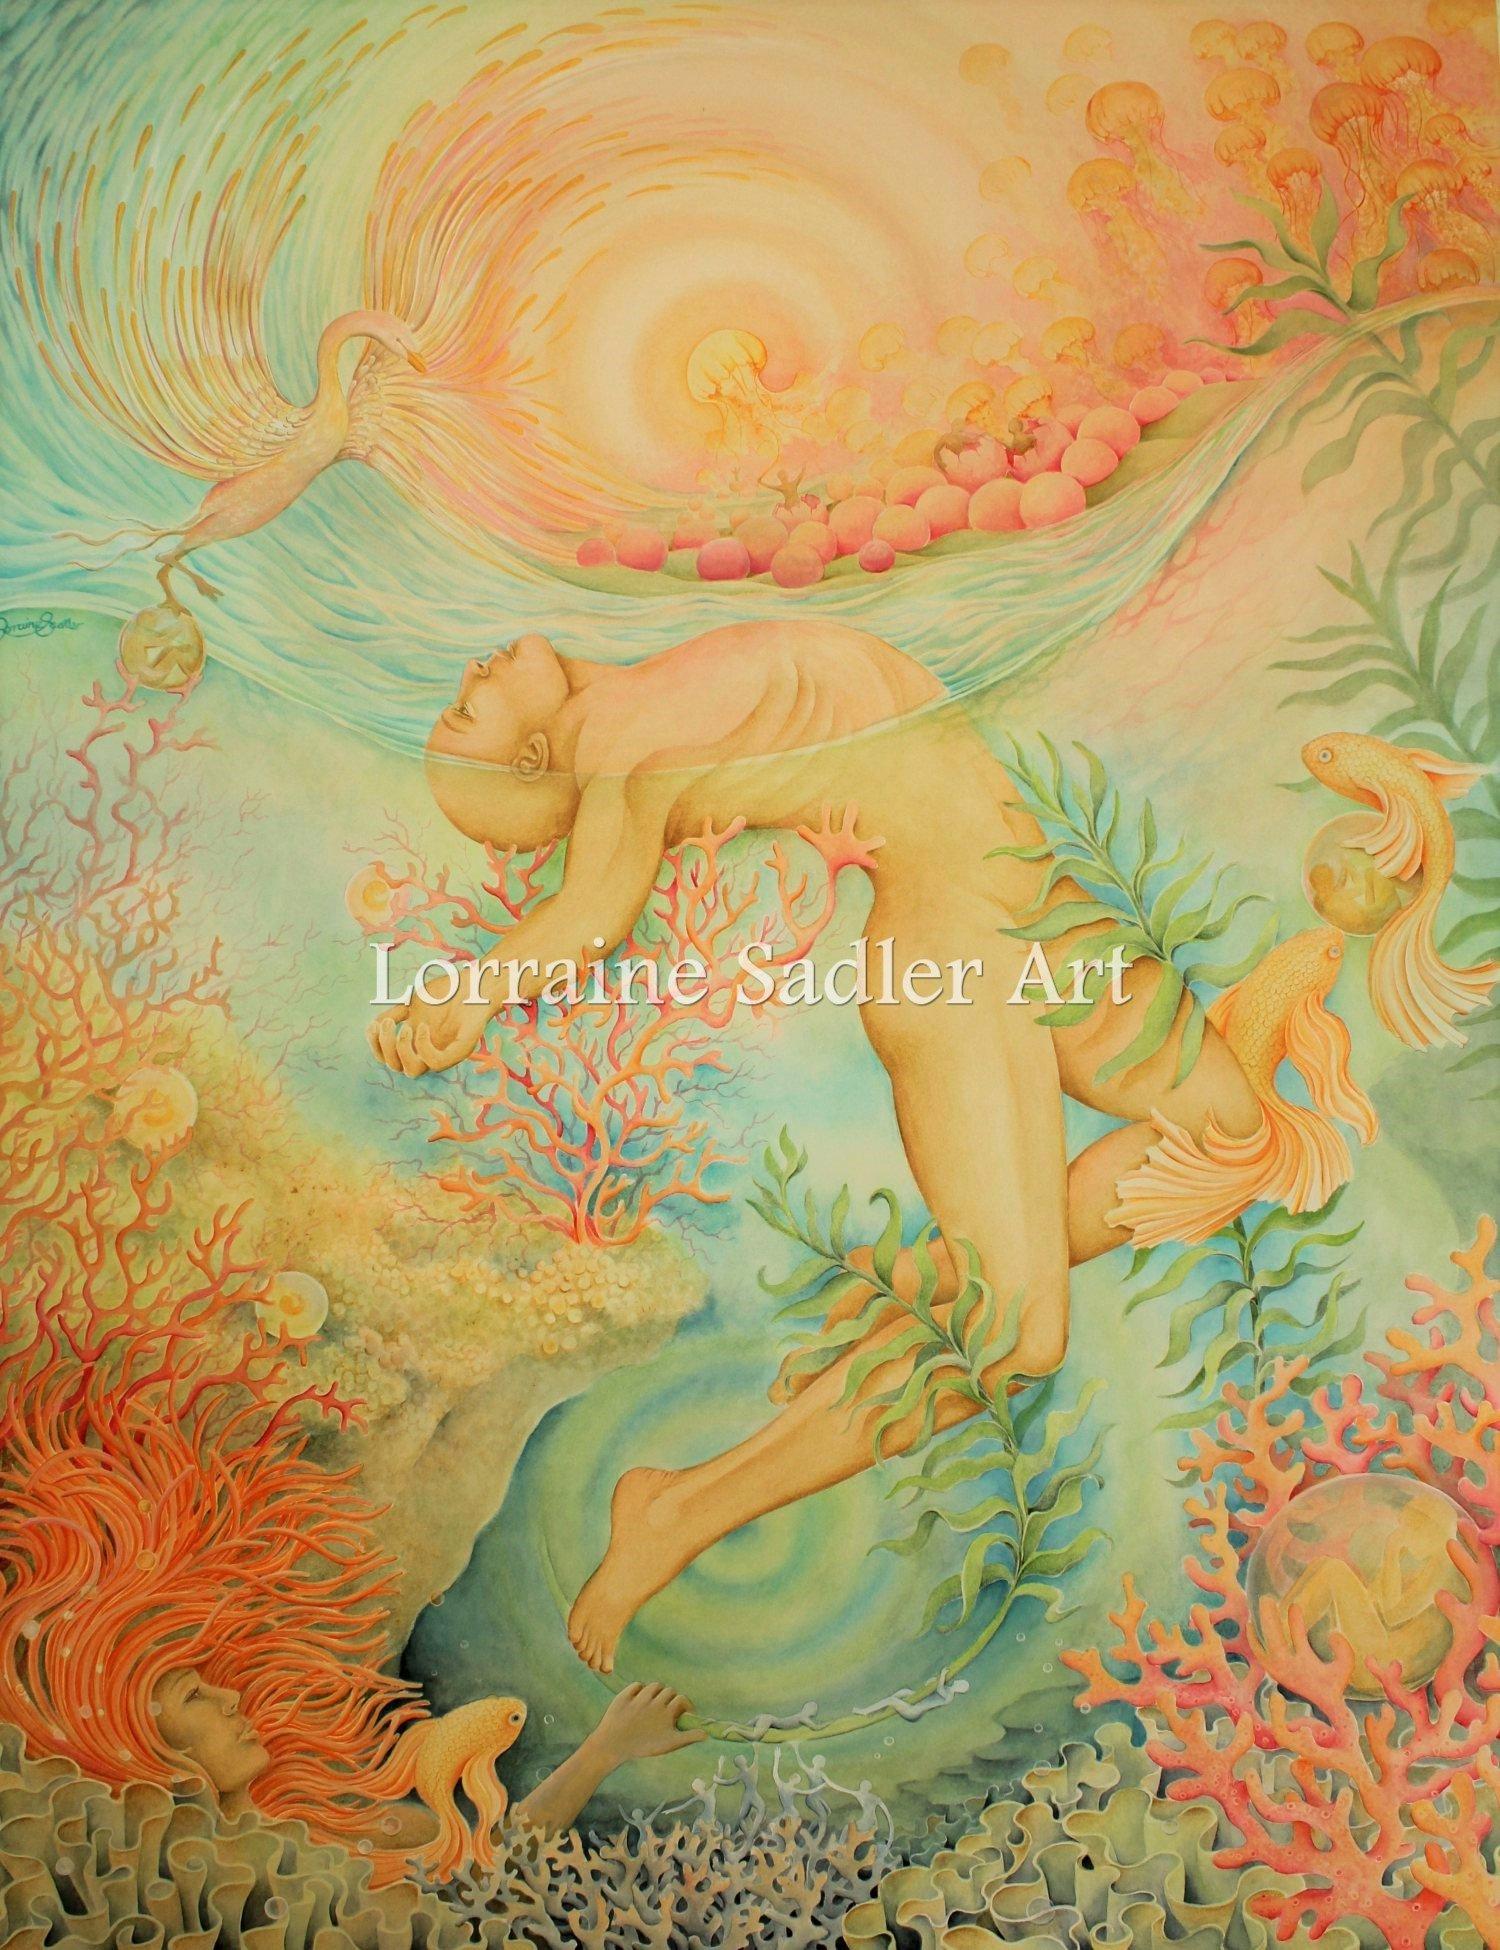 "24 x 31"" Gouache & Watercolour on Watercolour paper"